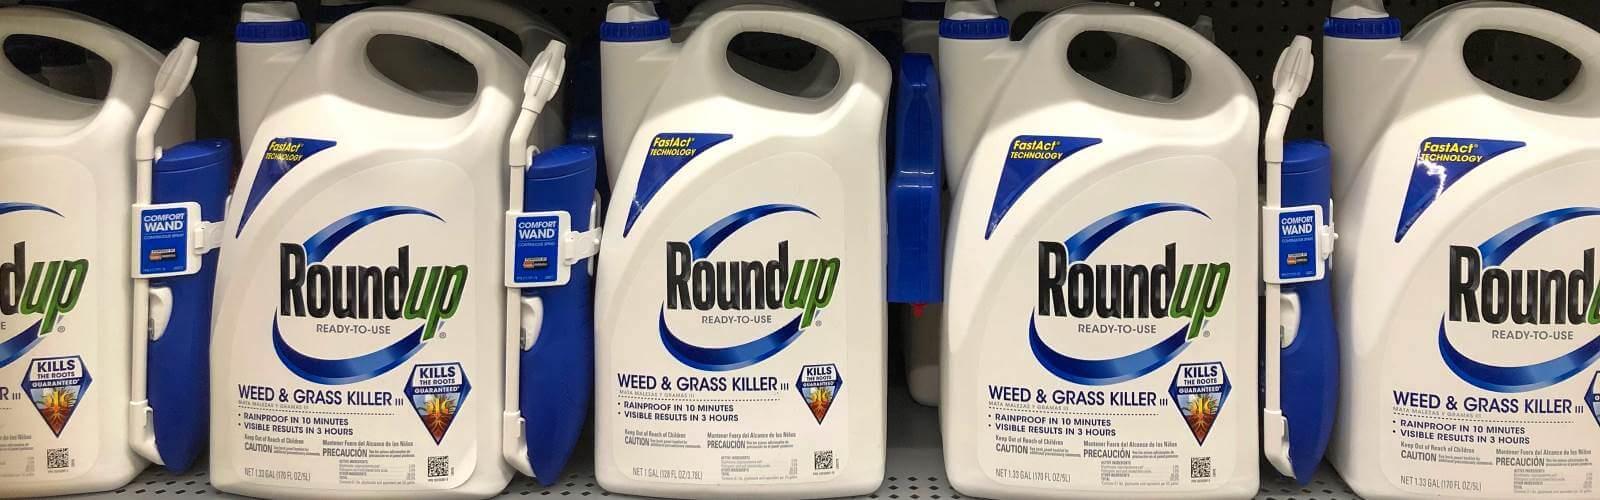 Roundup Cancer Lawsuit